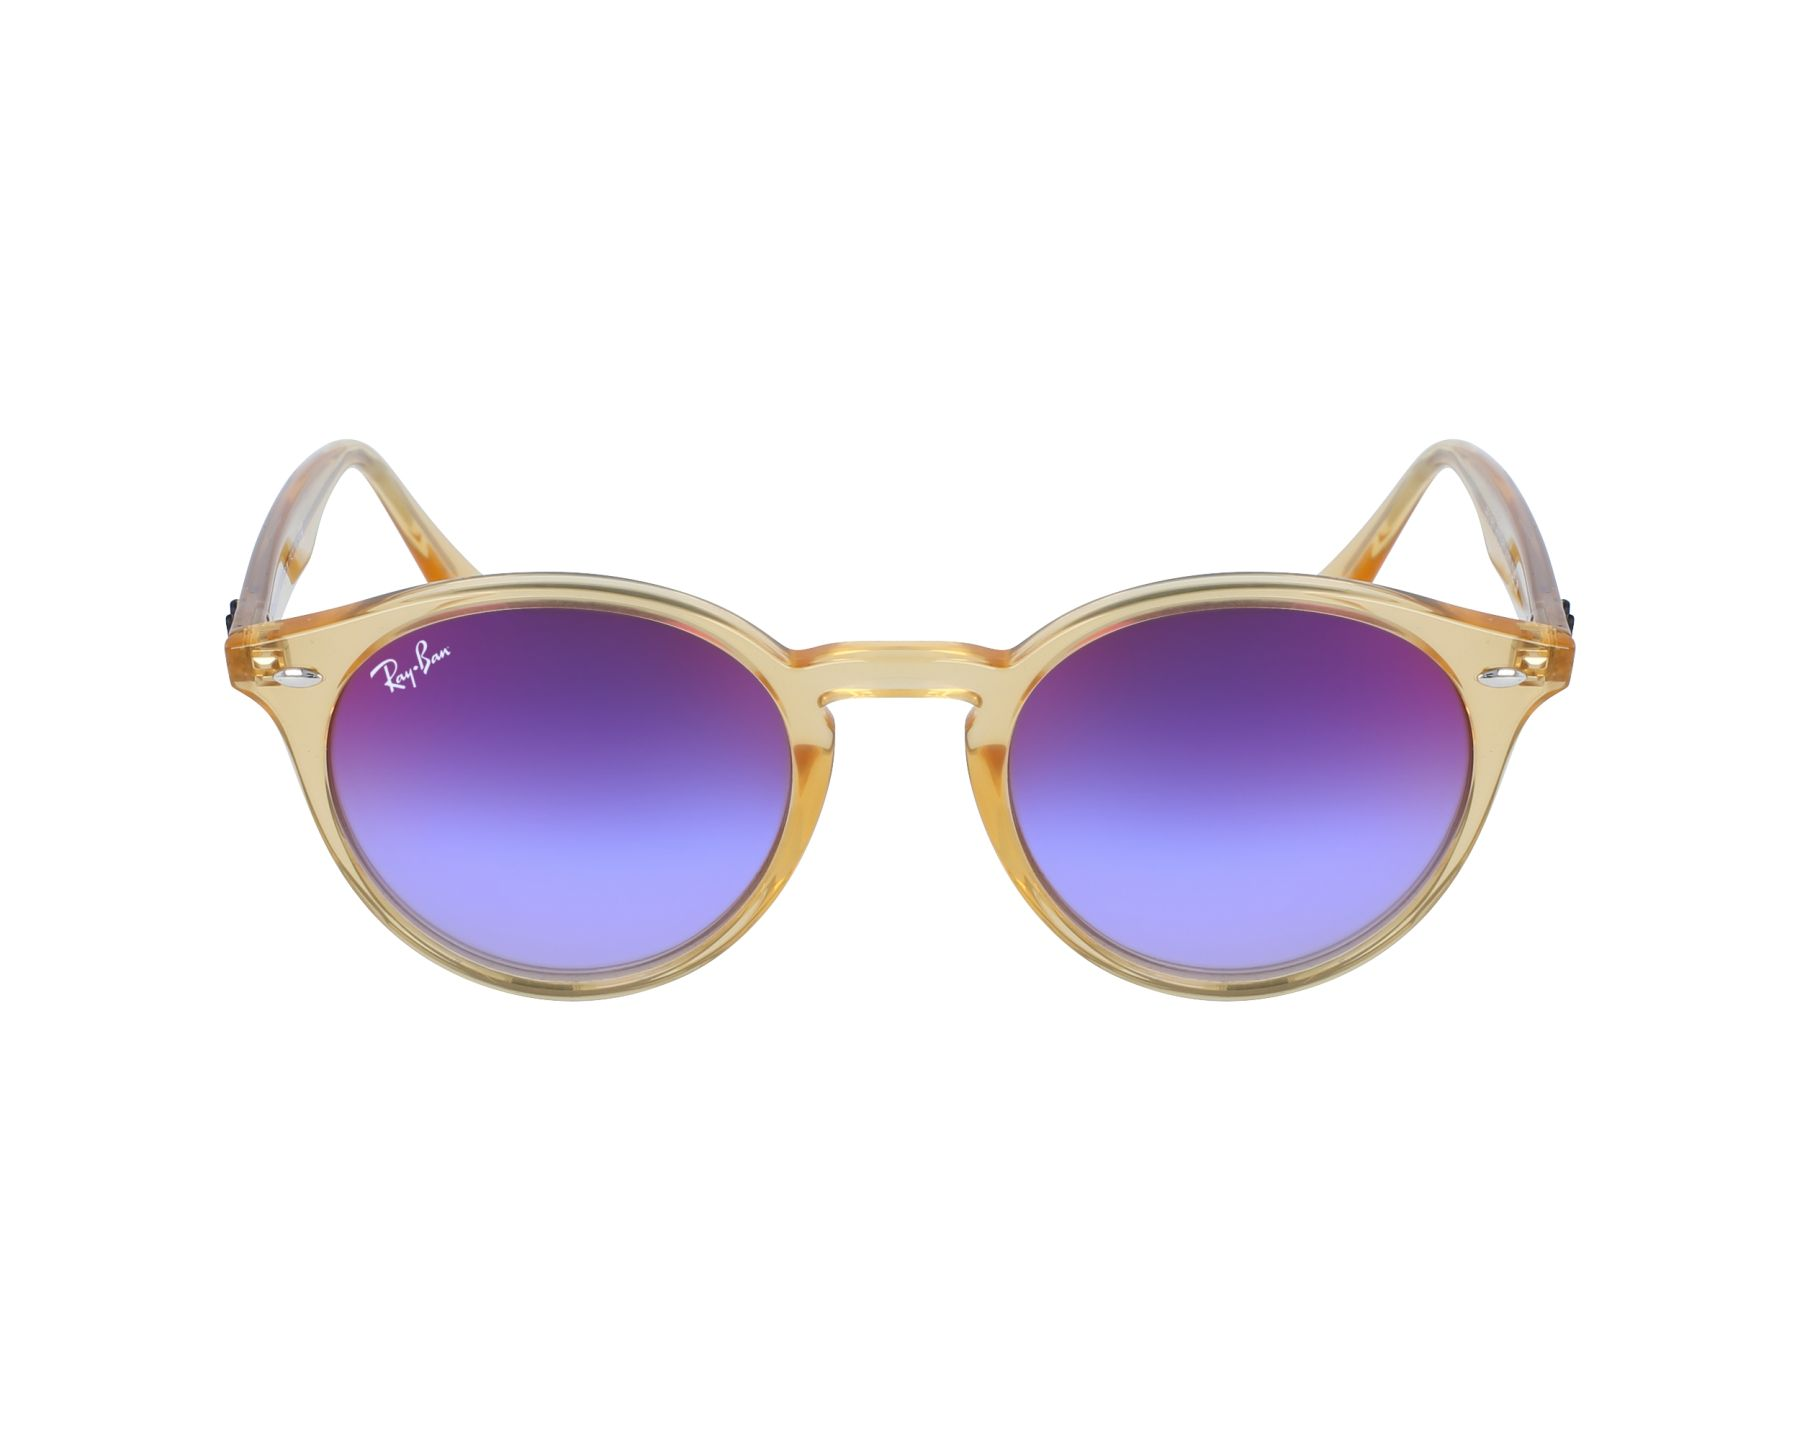 lunette de soleil femme ray ban effet miroir